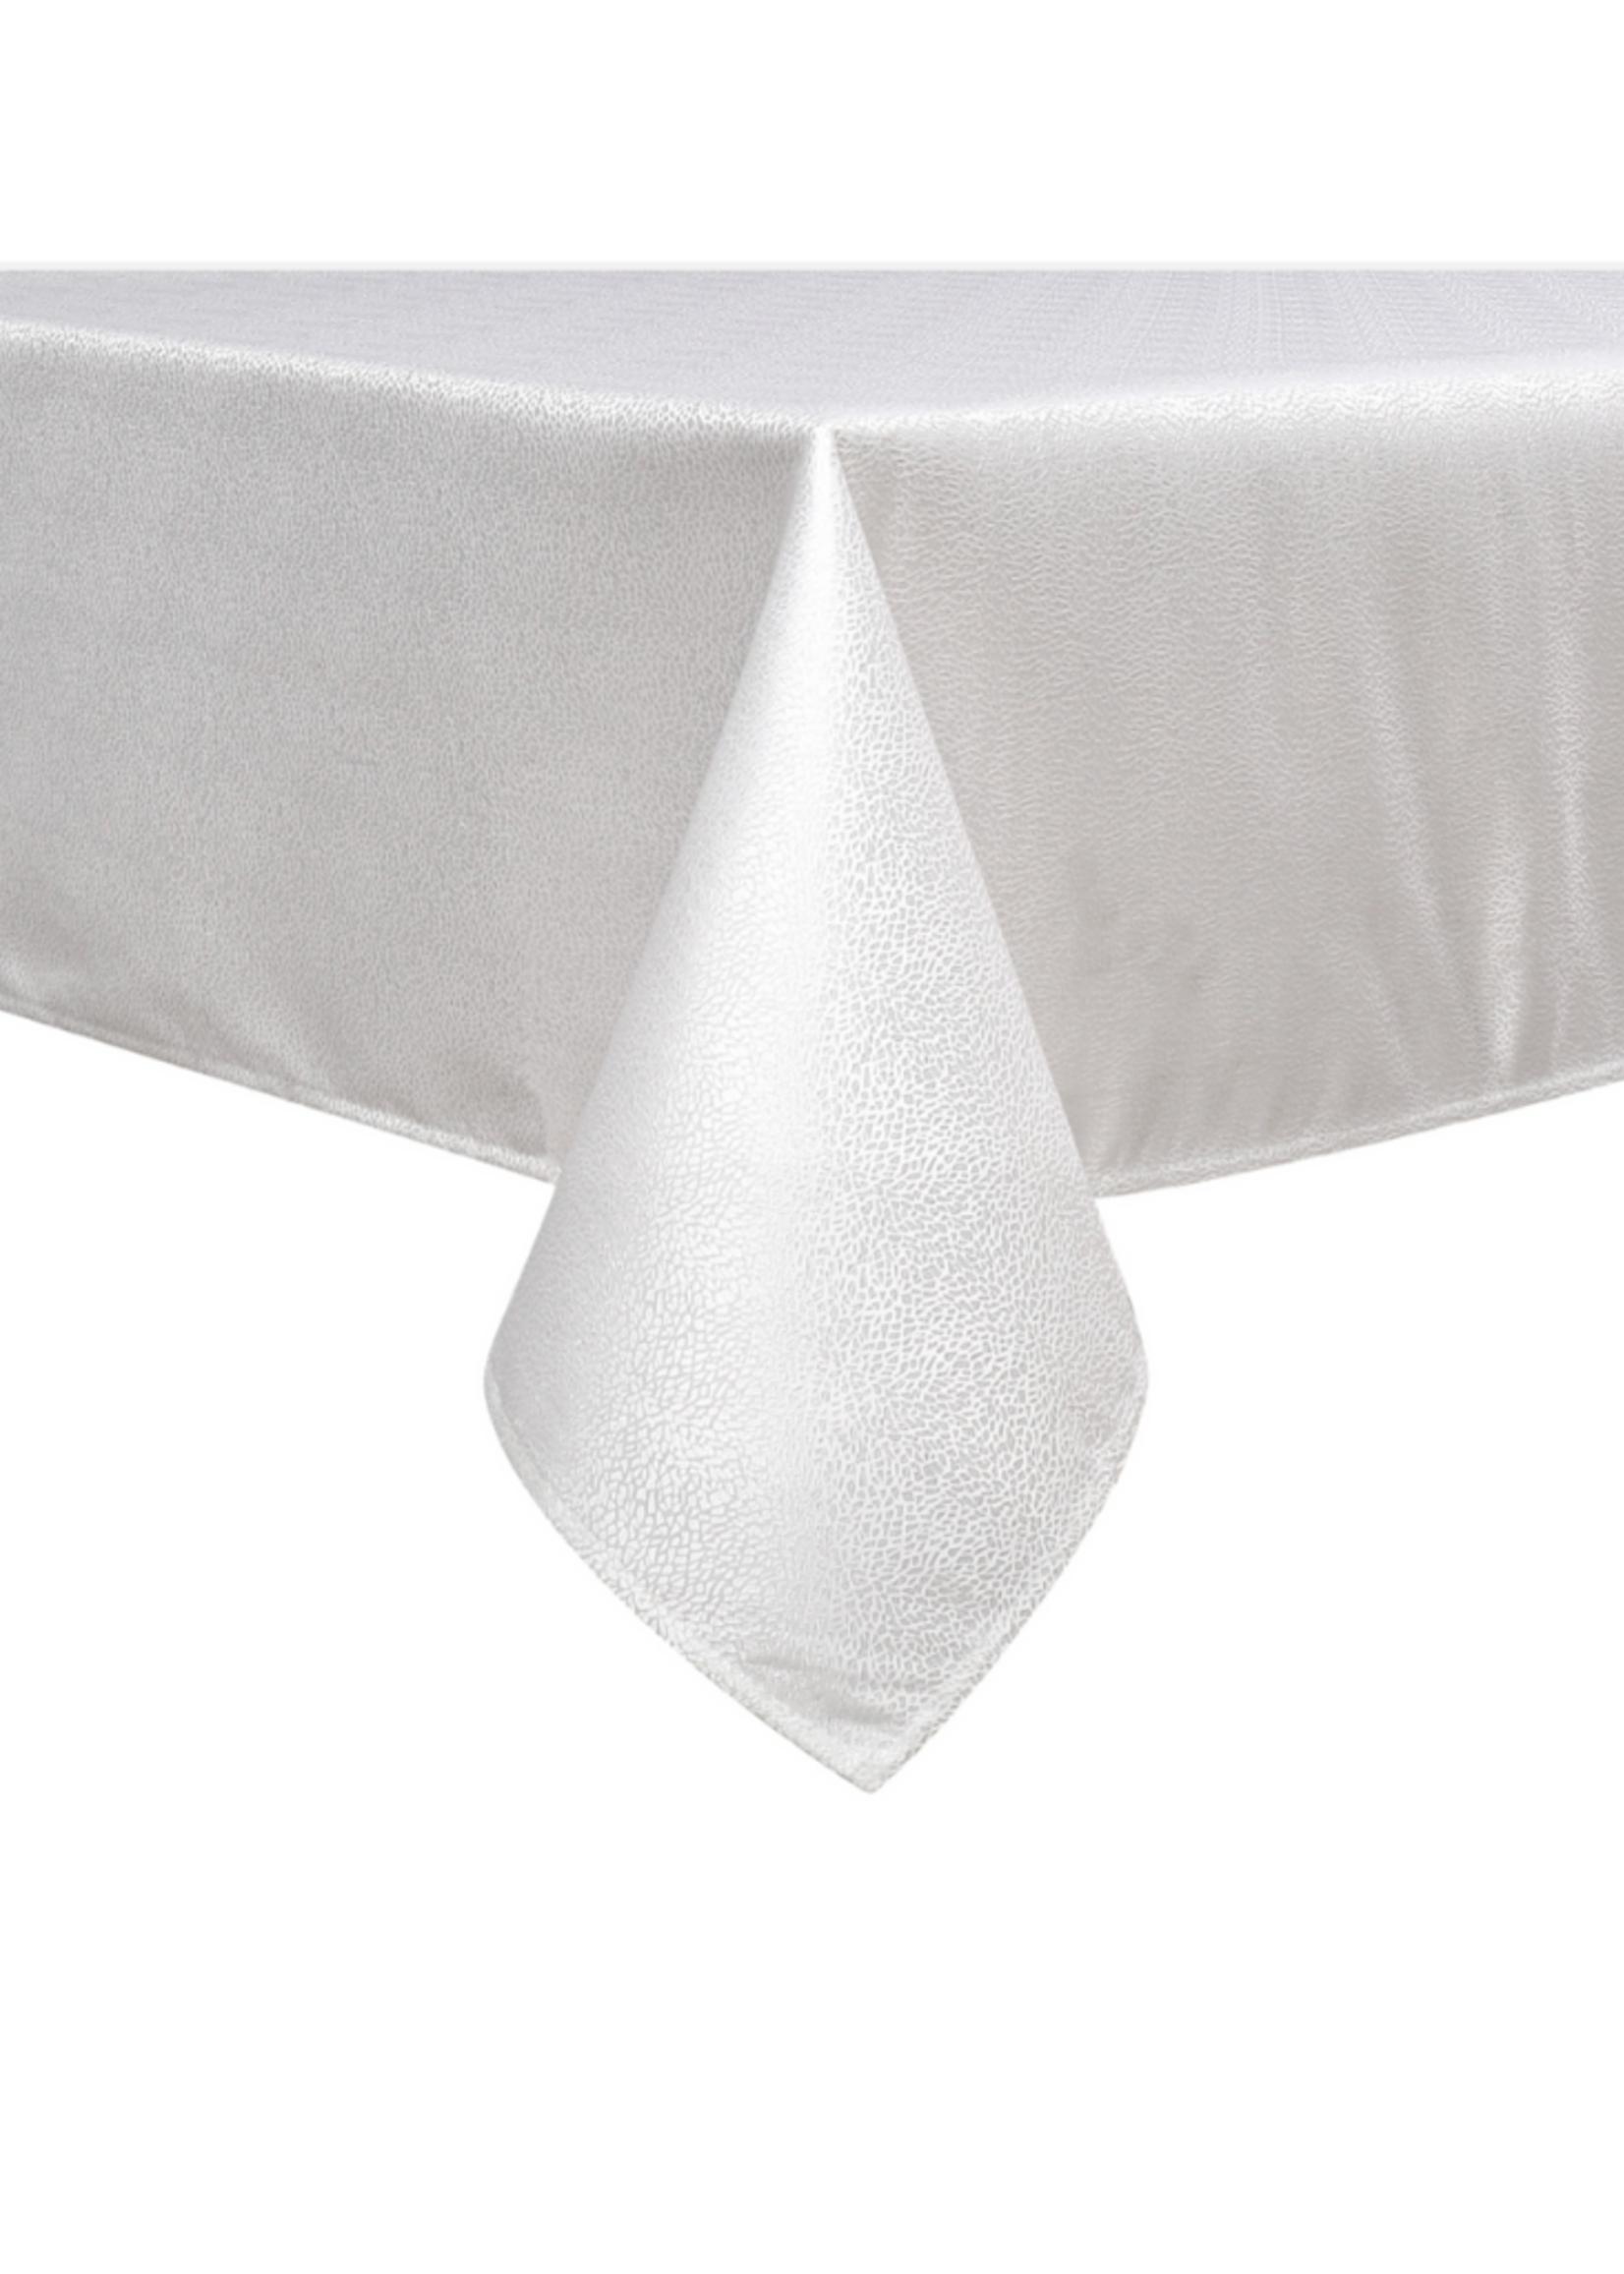 Jacquard Tablecloth // White Slate #1345